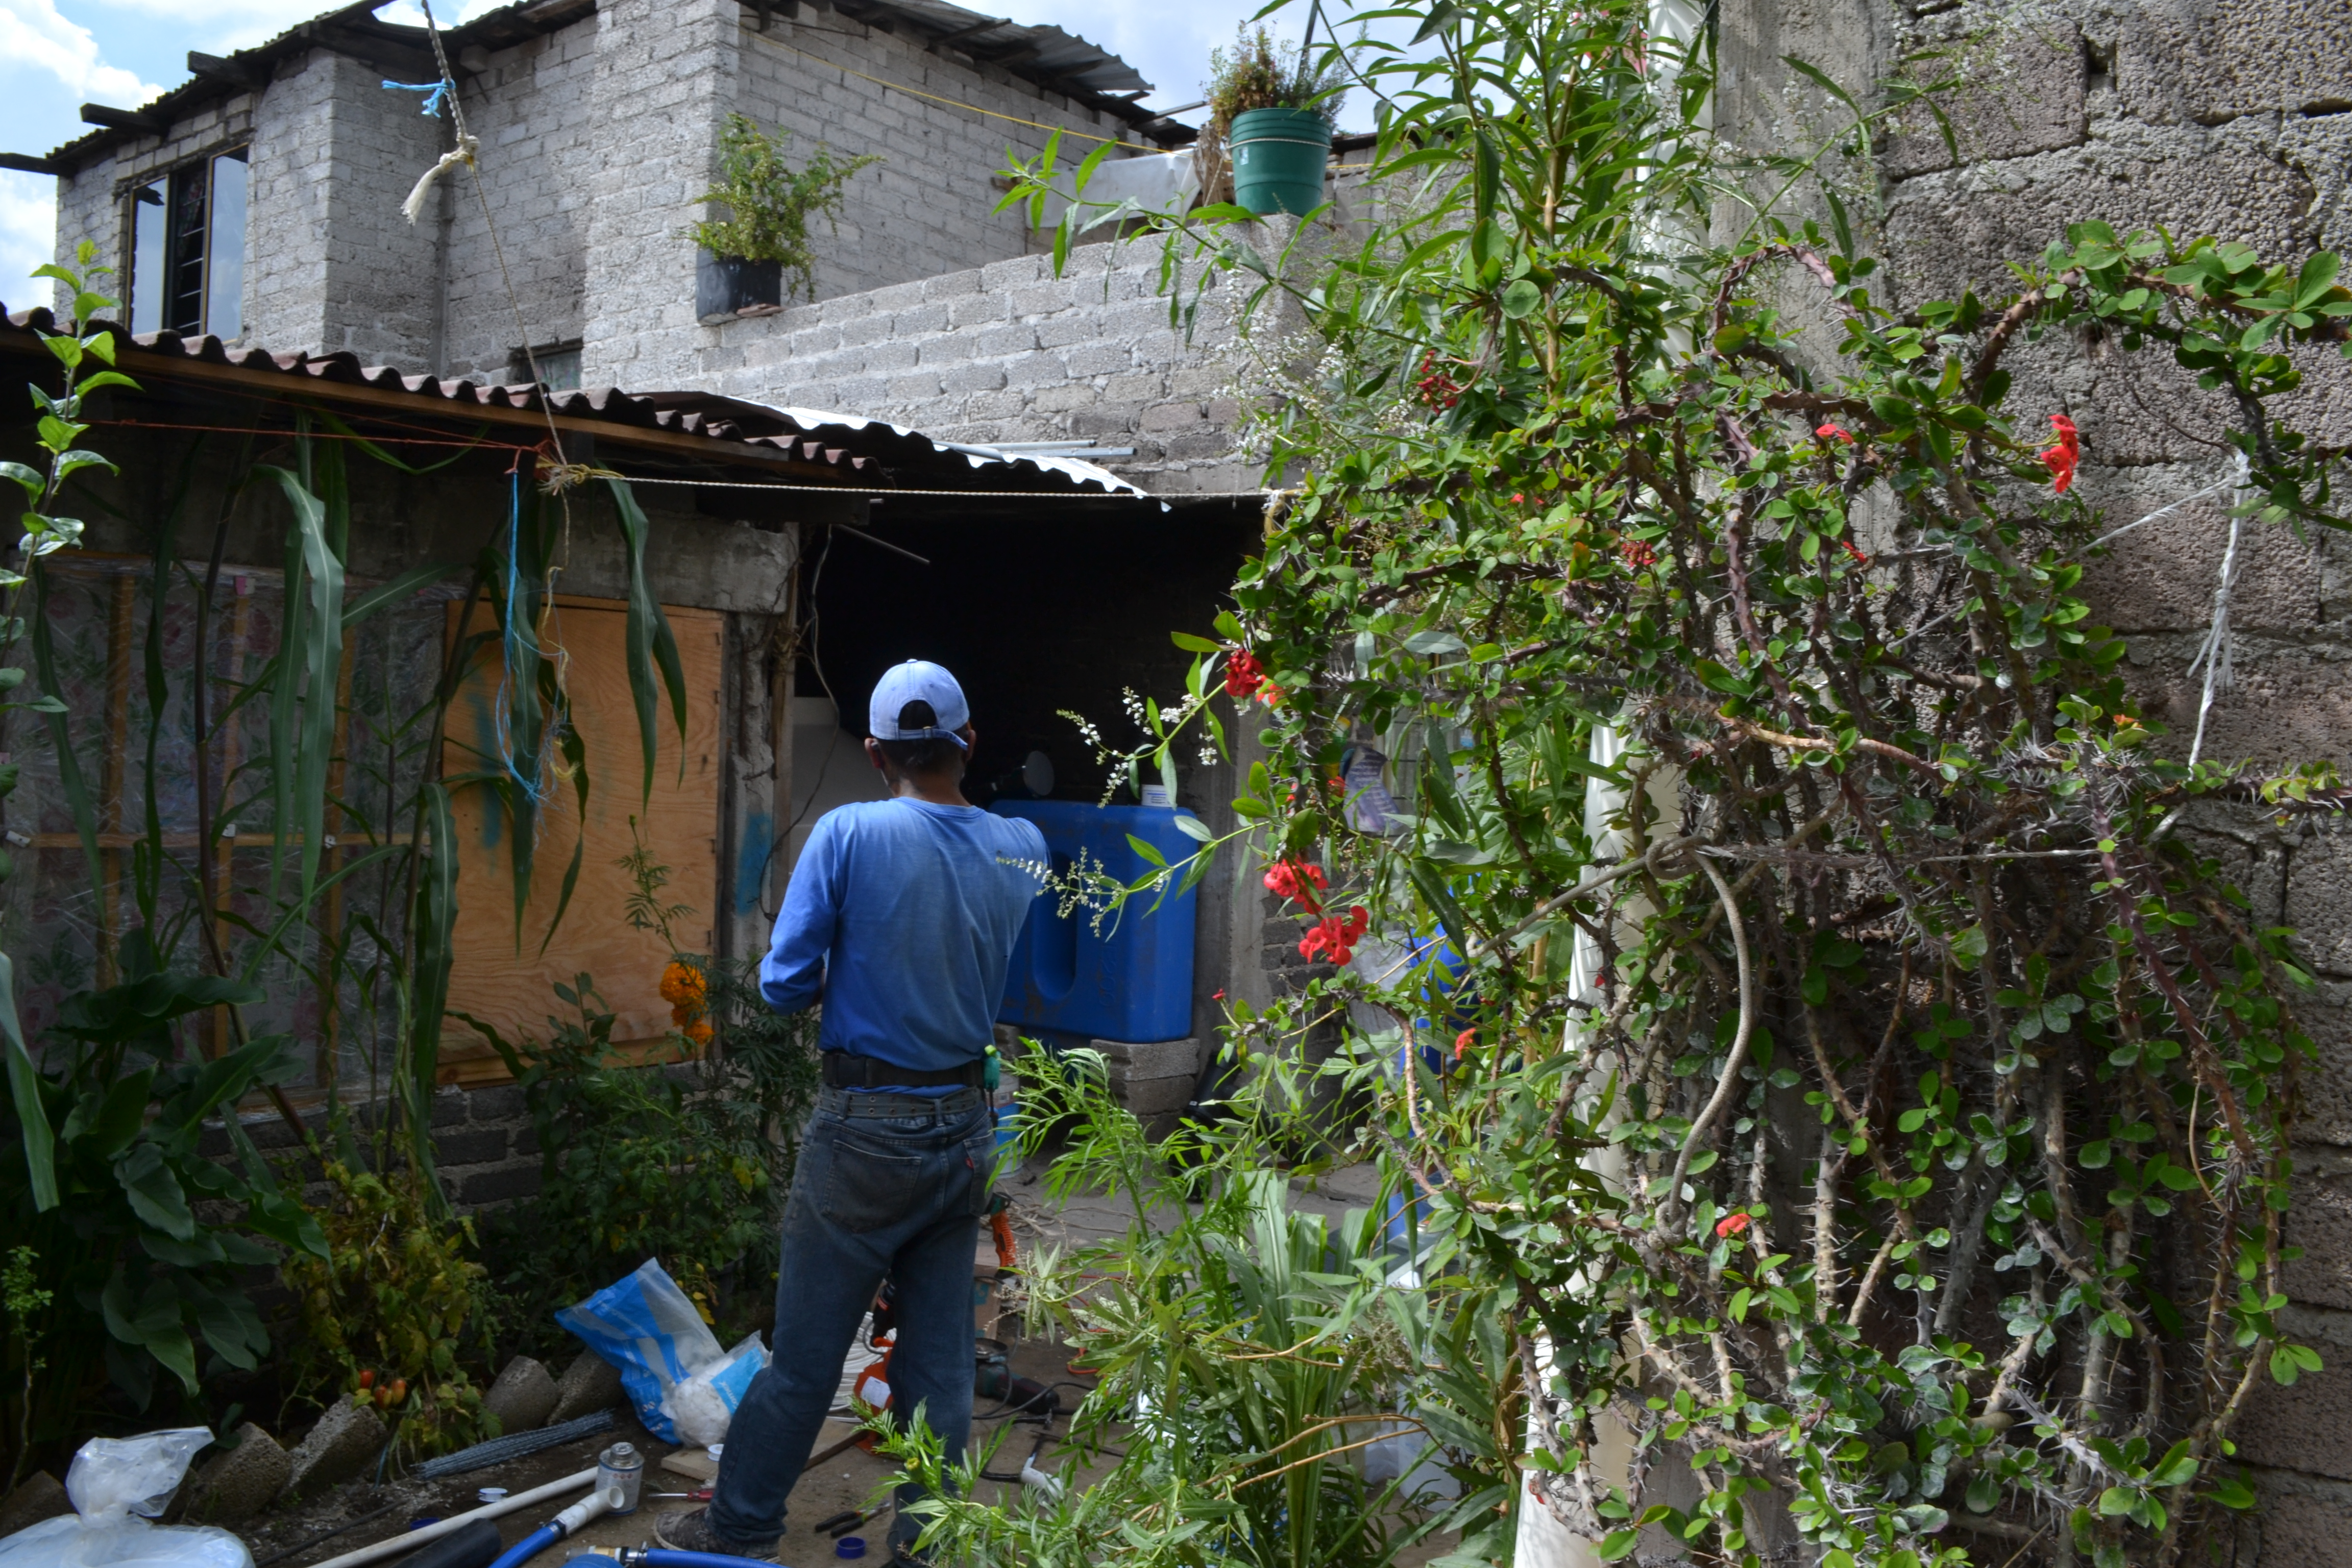 Isla Urbana installs a rainwater harvesting system at Severa Galicia Flores' house on 9 September 2020